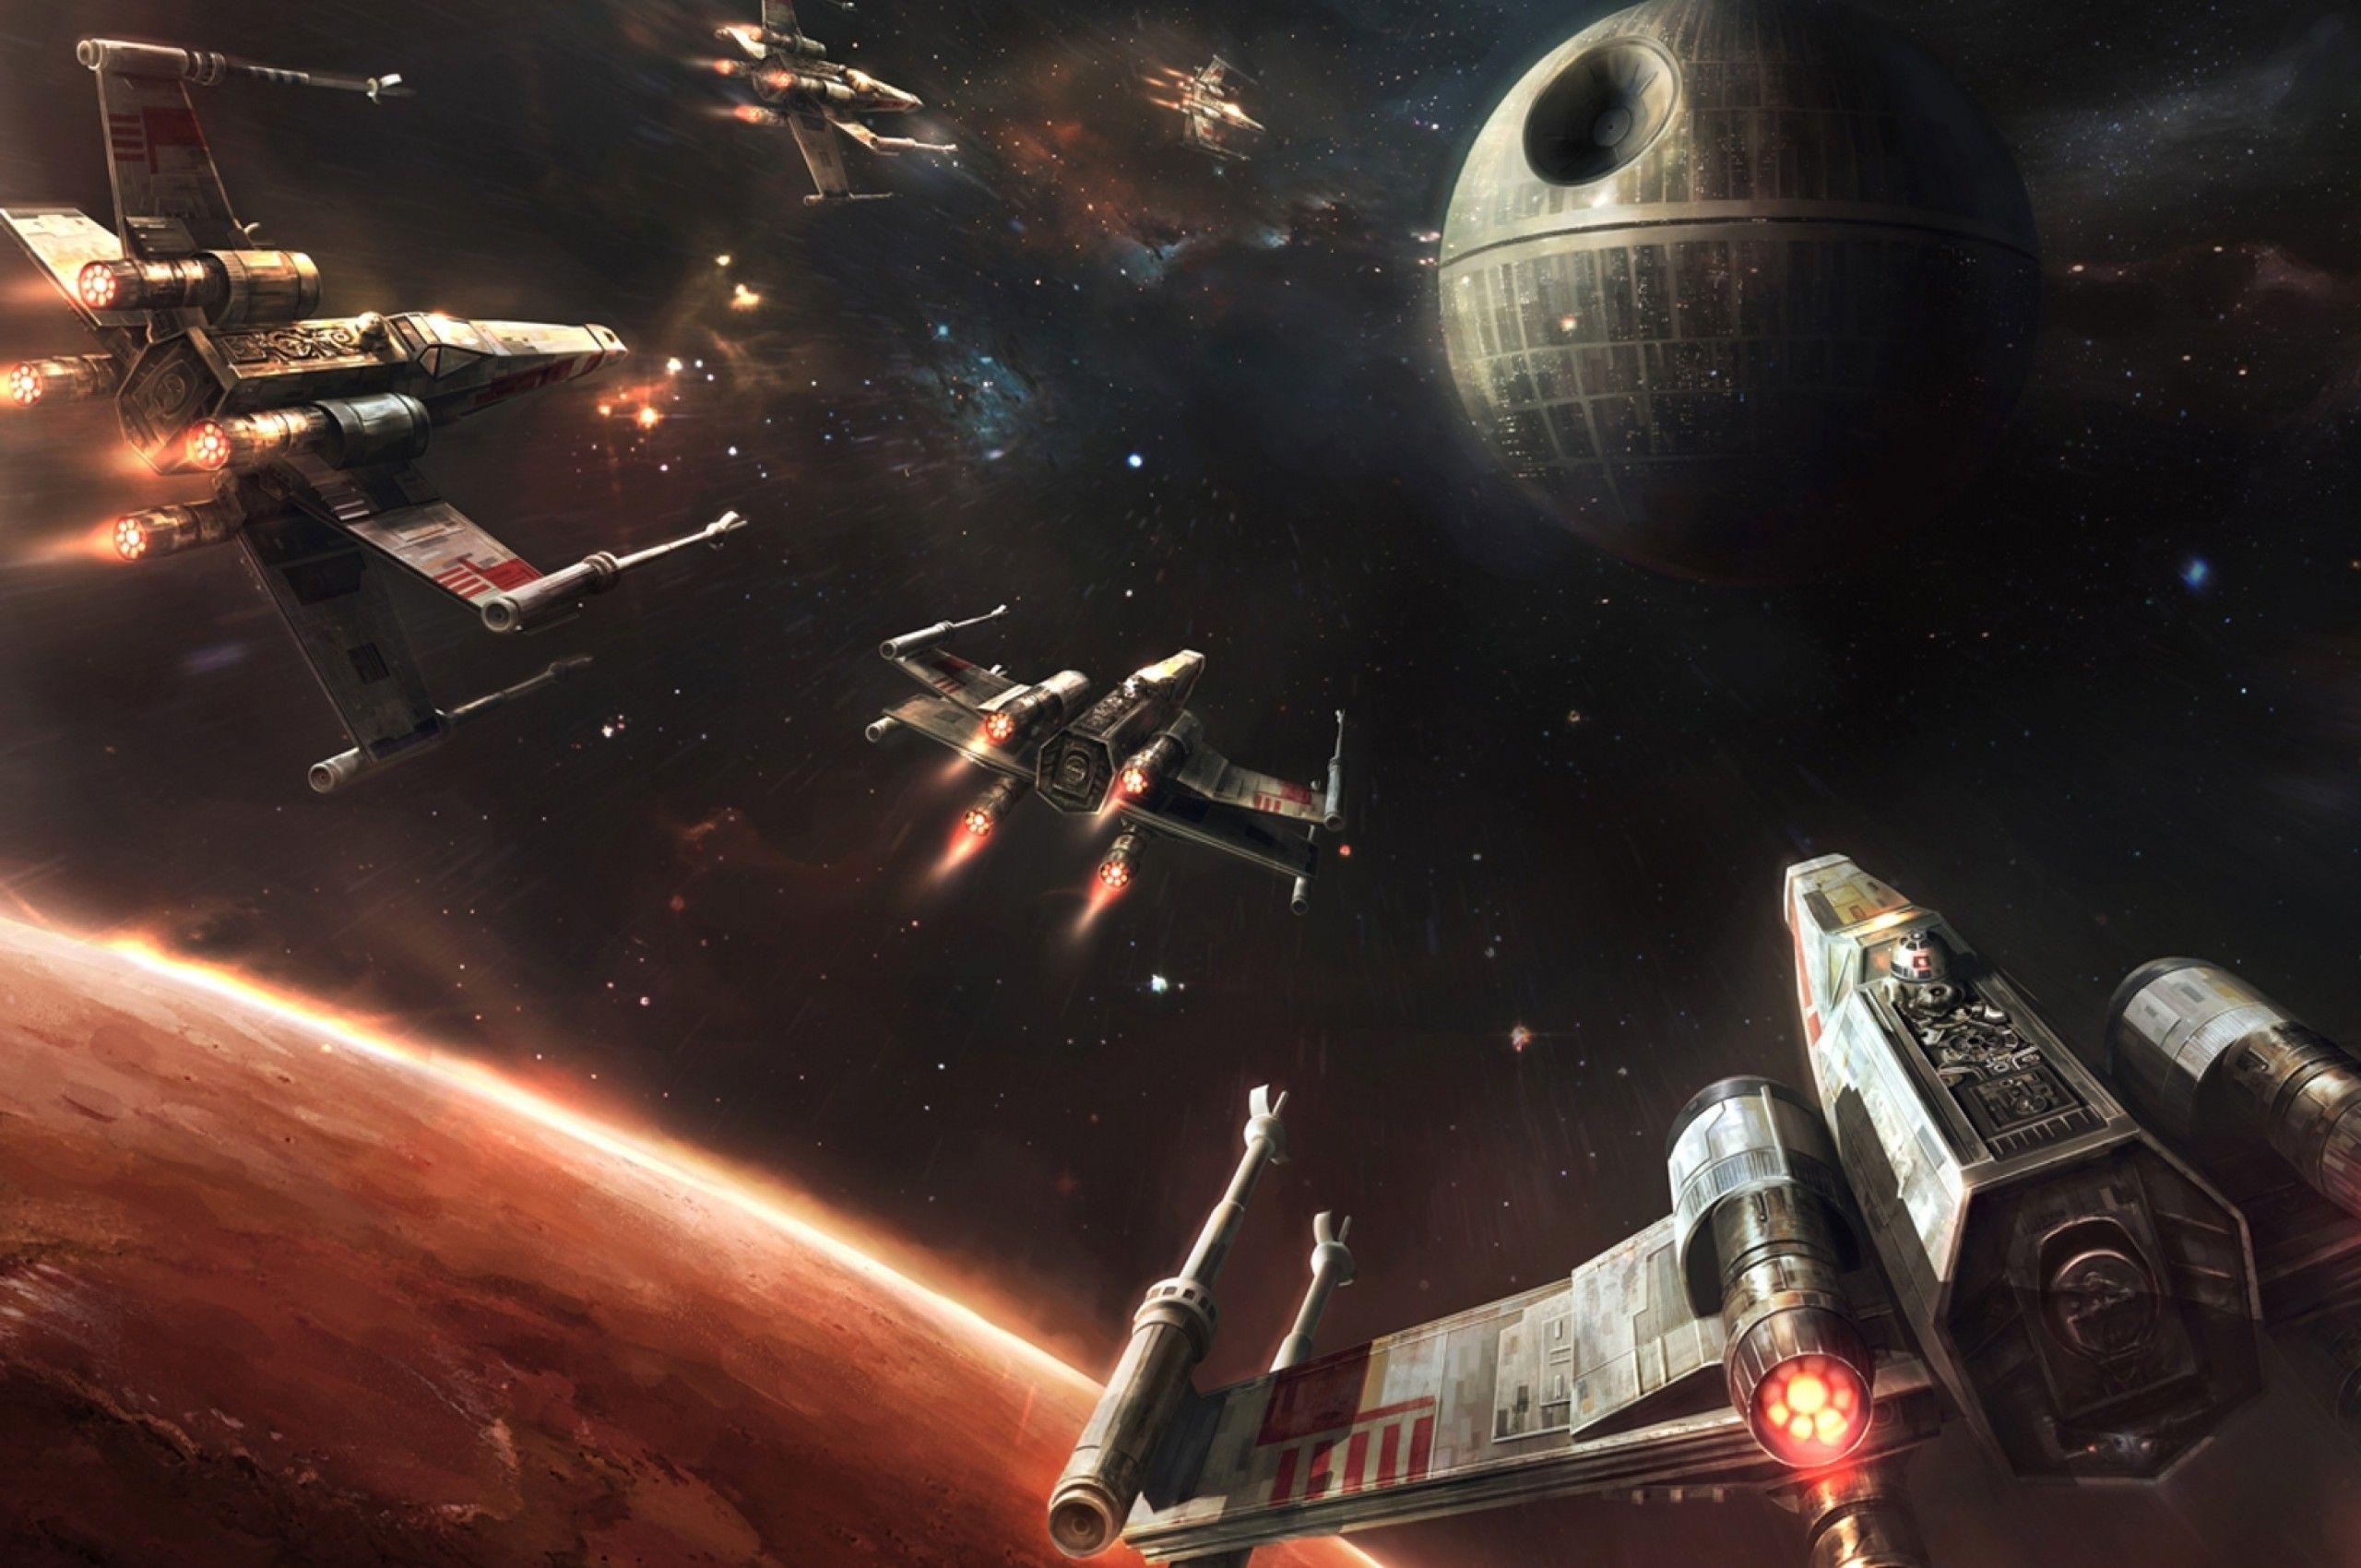 Death Star Desktop Wallpapers Wallpaper Cave